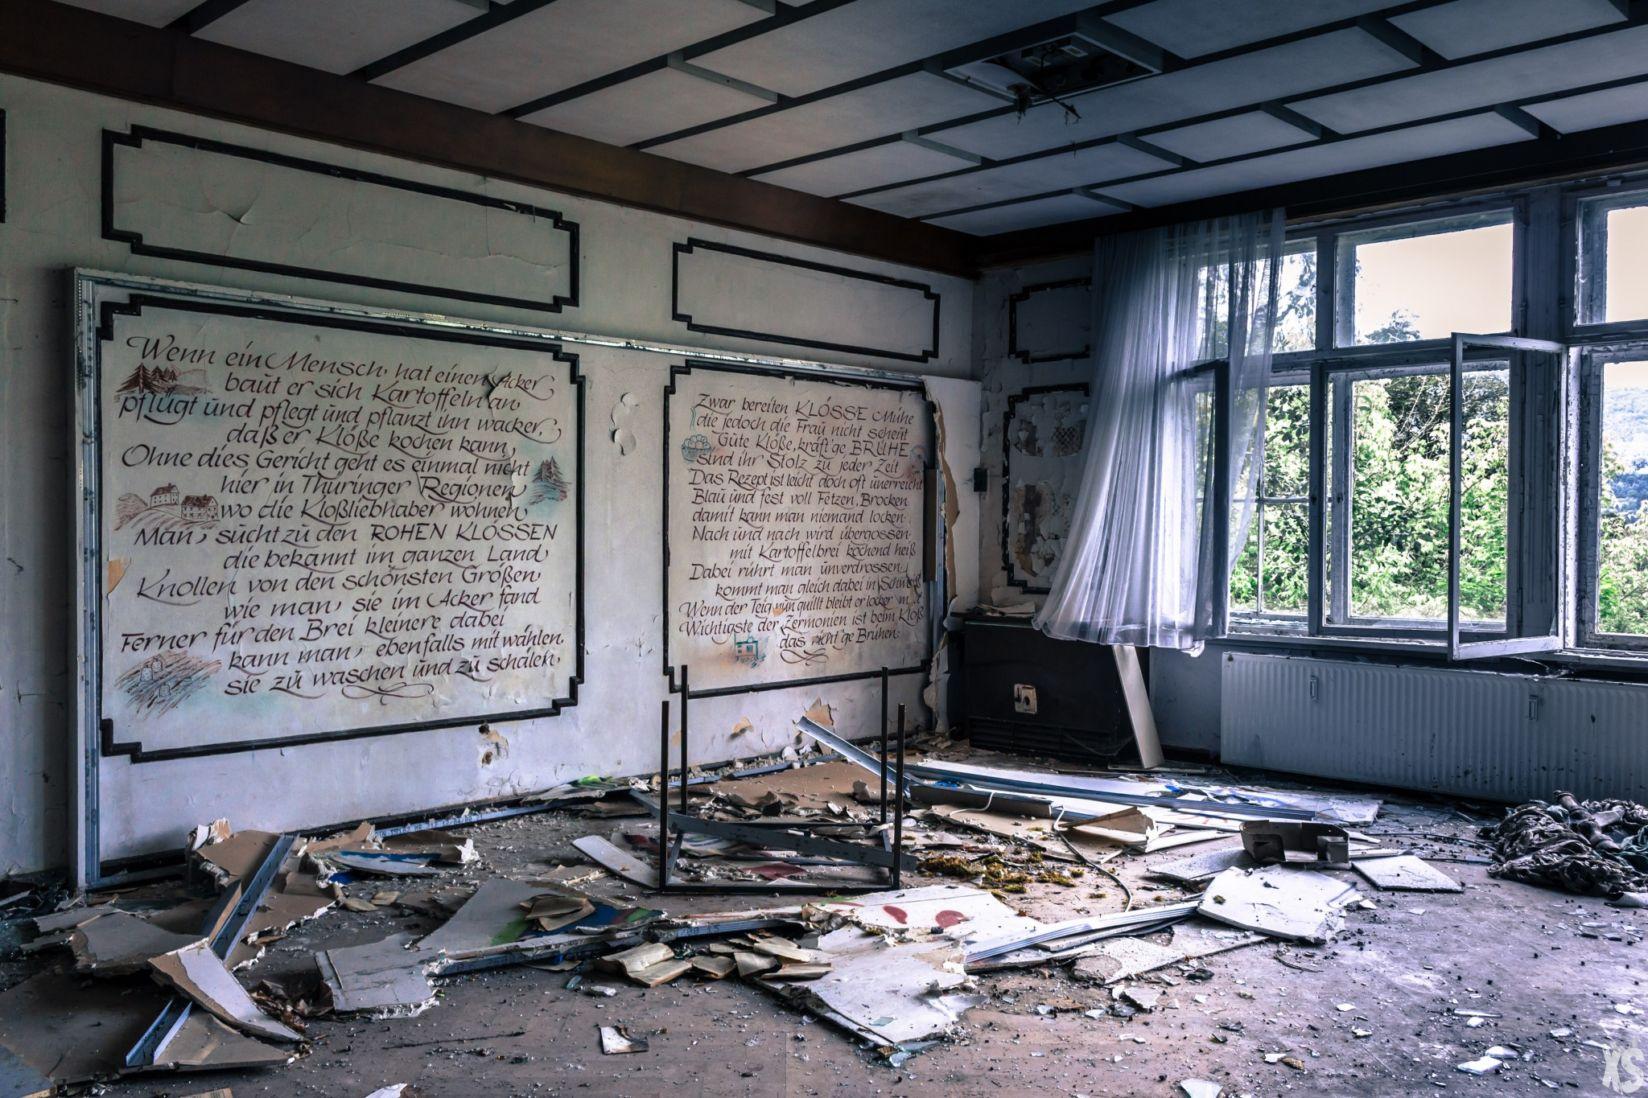 sanatorium-klaas-annink-3